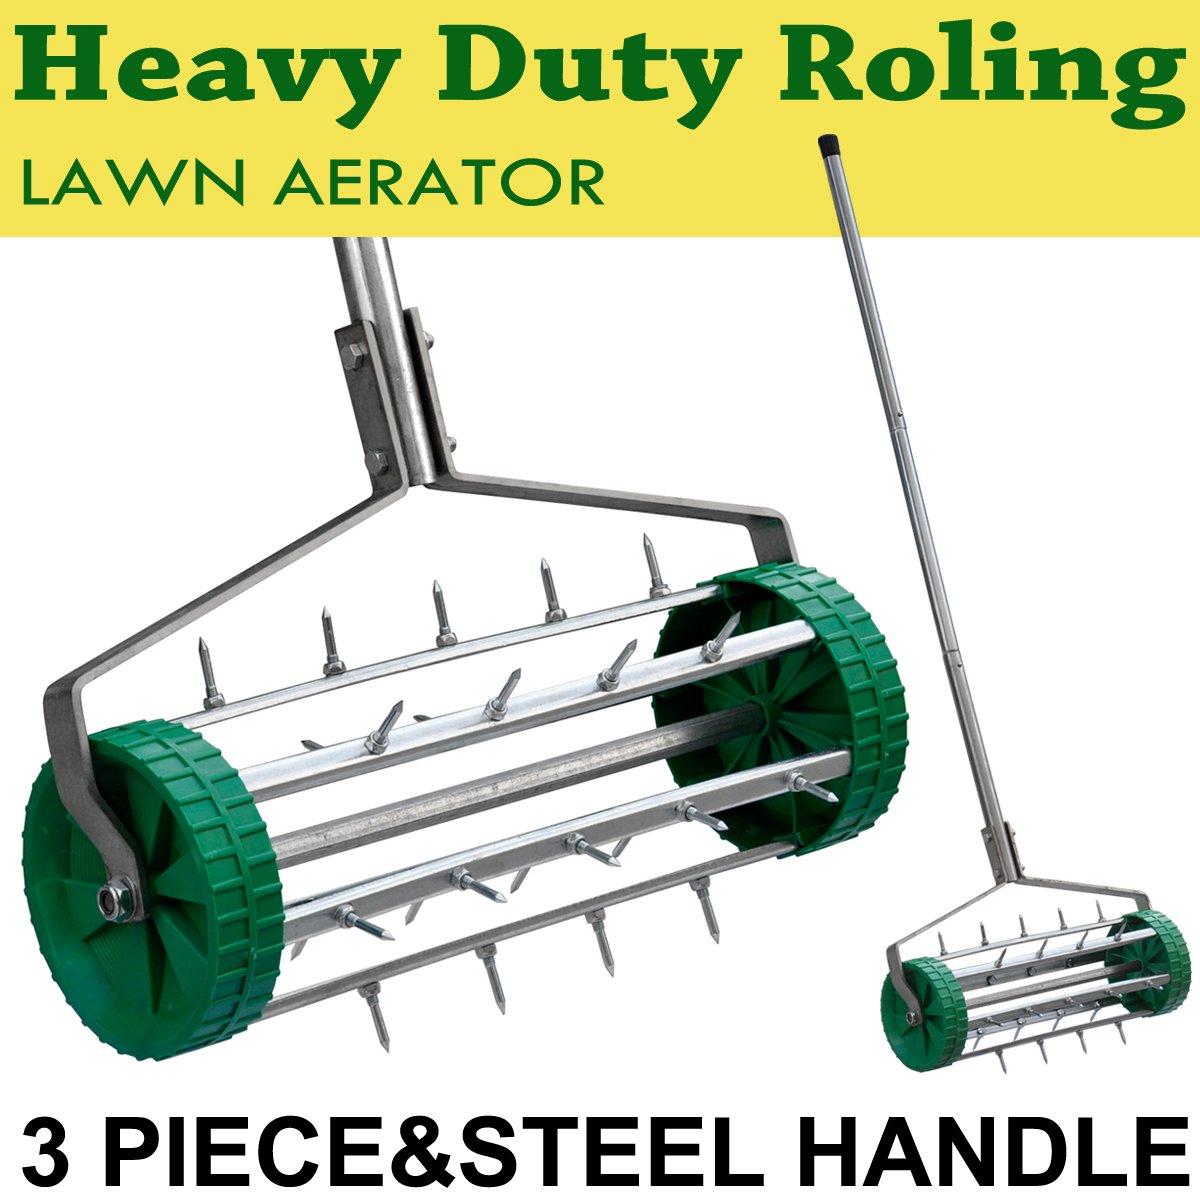 Beyondfashion 3.5cm Spiked Rolling Grass Lawn Aeration Roller 36cm Garden Soil Fertilize